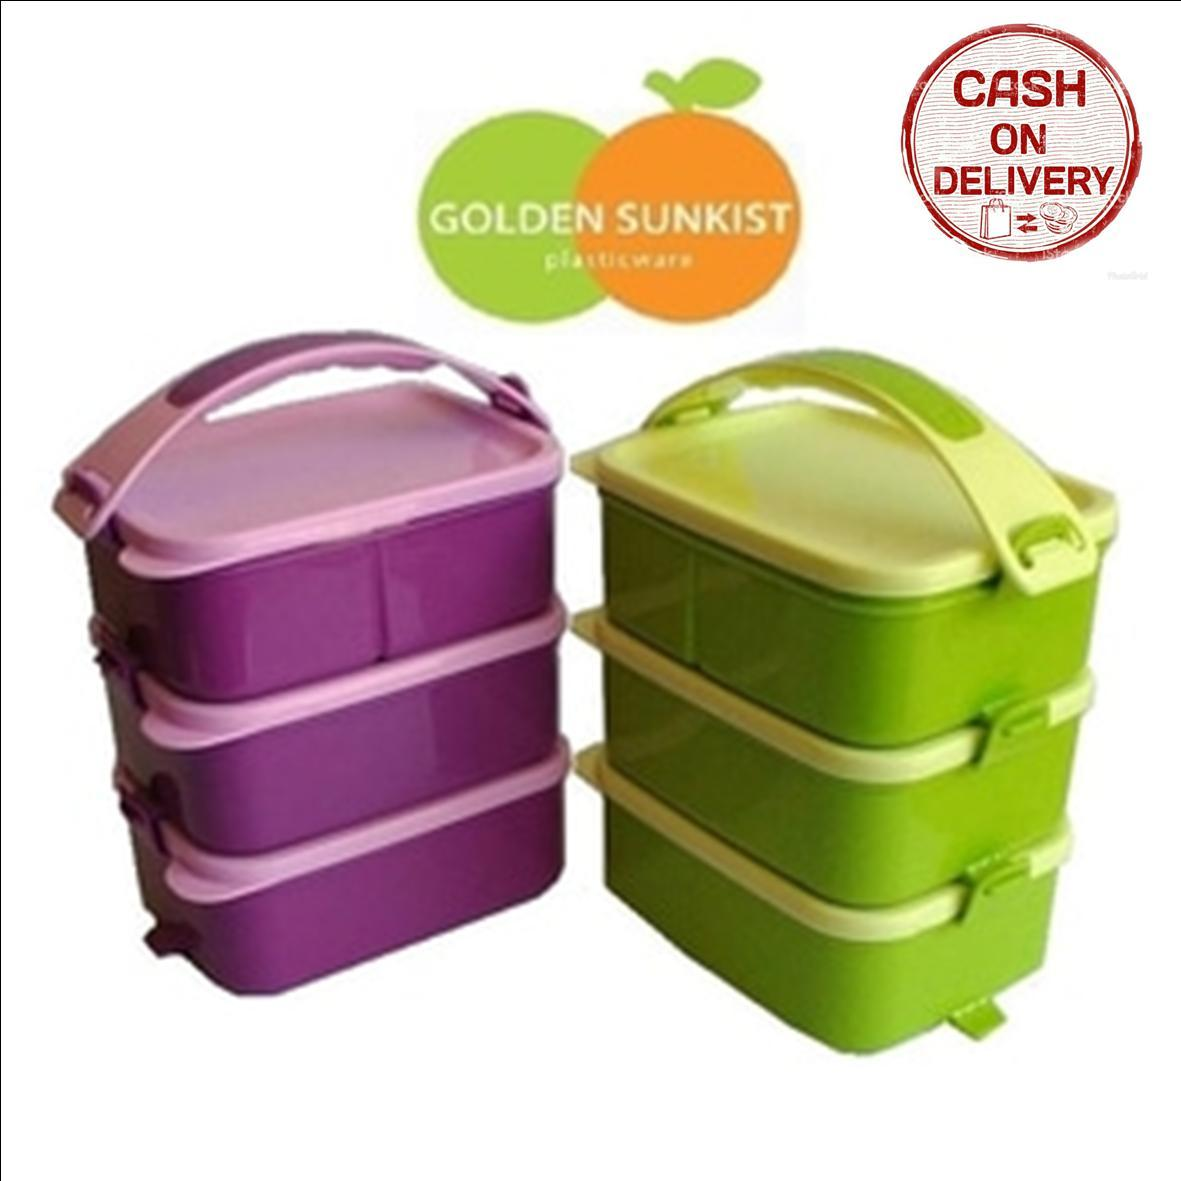 Daftar Harga Tempat Makan Susun Murah Terbaru Desember 2018 Dodawa Rantang Lunch Box 3 Kado Unik Piknik Golden Sunkist Penyimpanan Makanan Polos Plastik